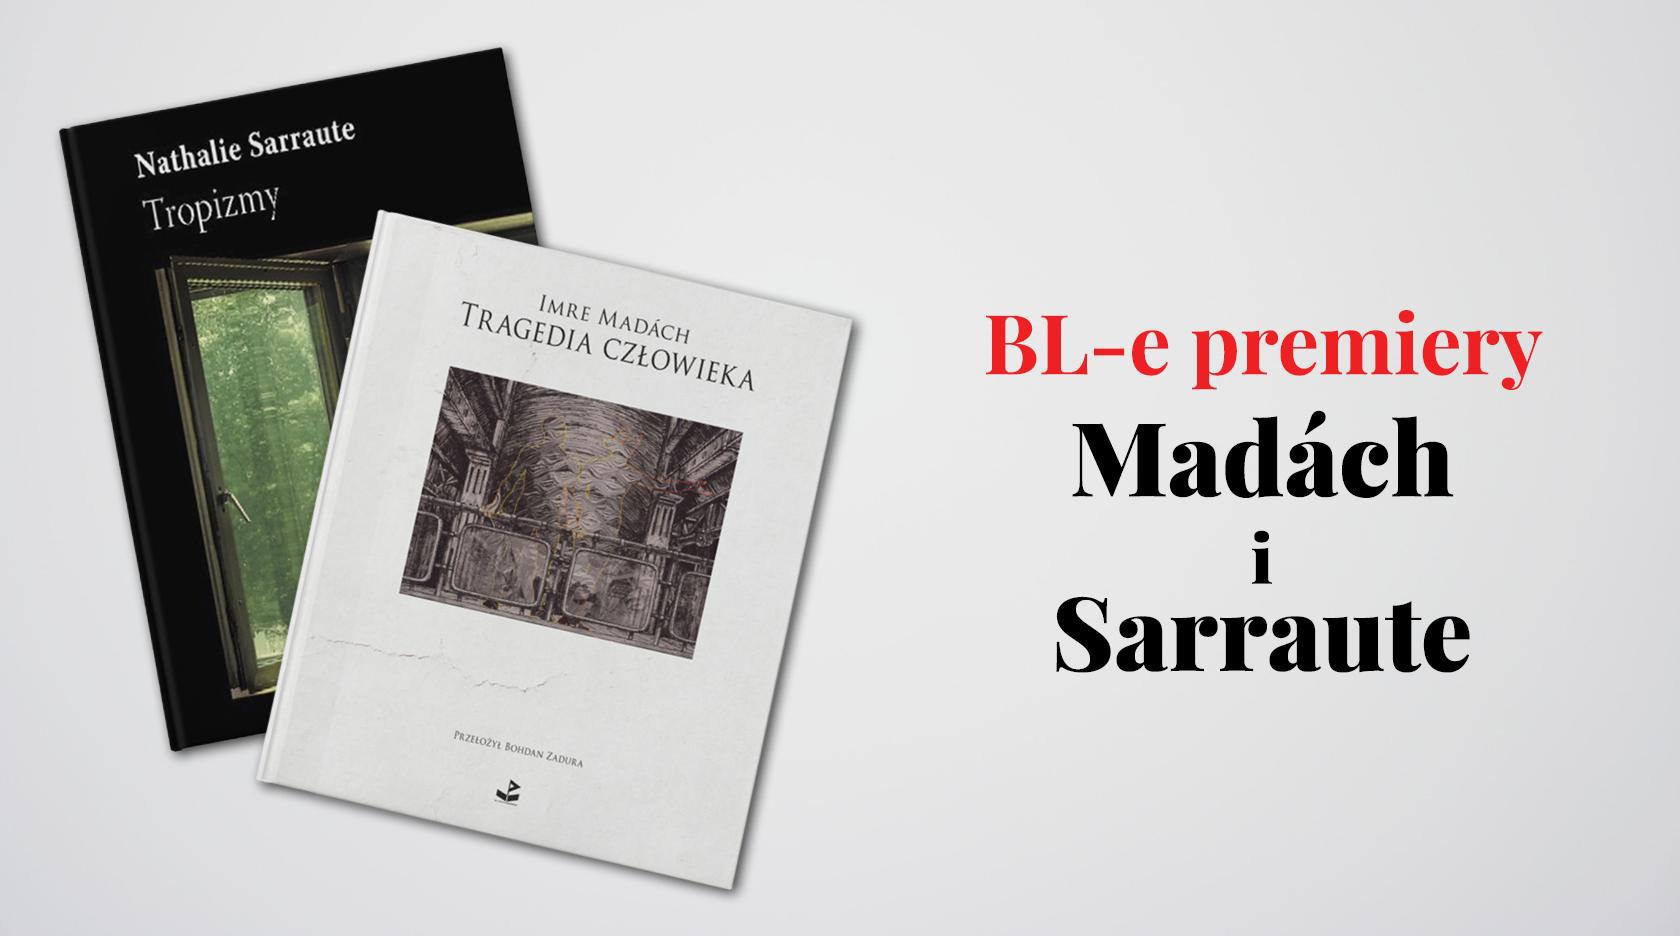 BL Img 2017.04.11 BL-e premiery MADÁCH i SARRAUTE_www_top